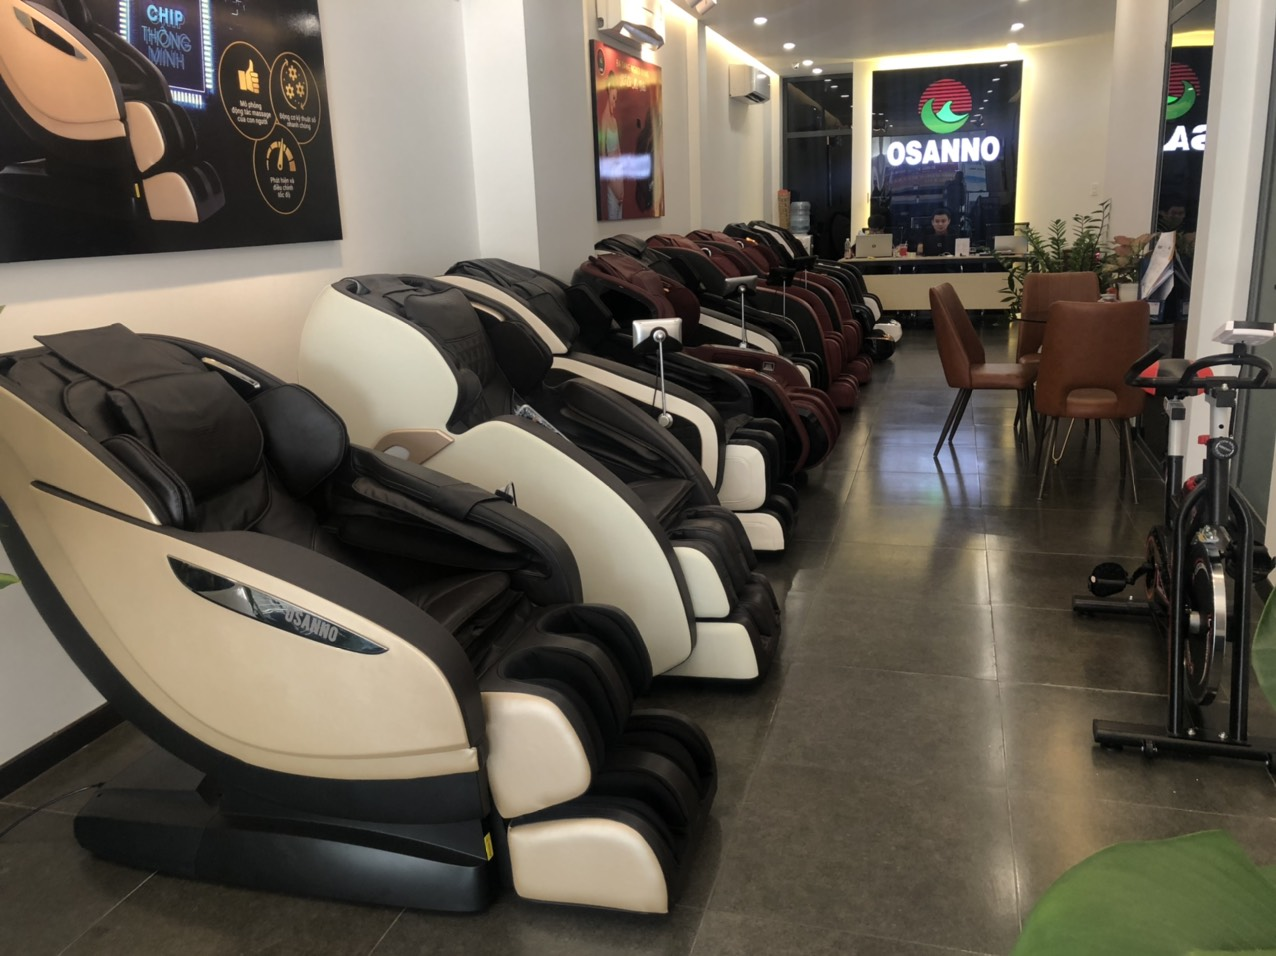 Showroom ghế massage Osanno tại Đồng Nai